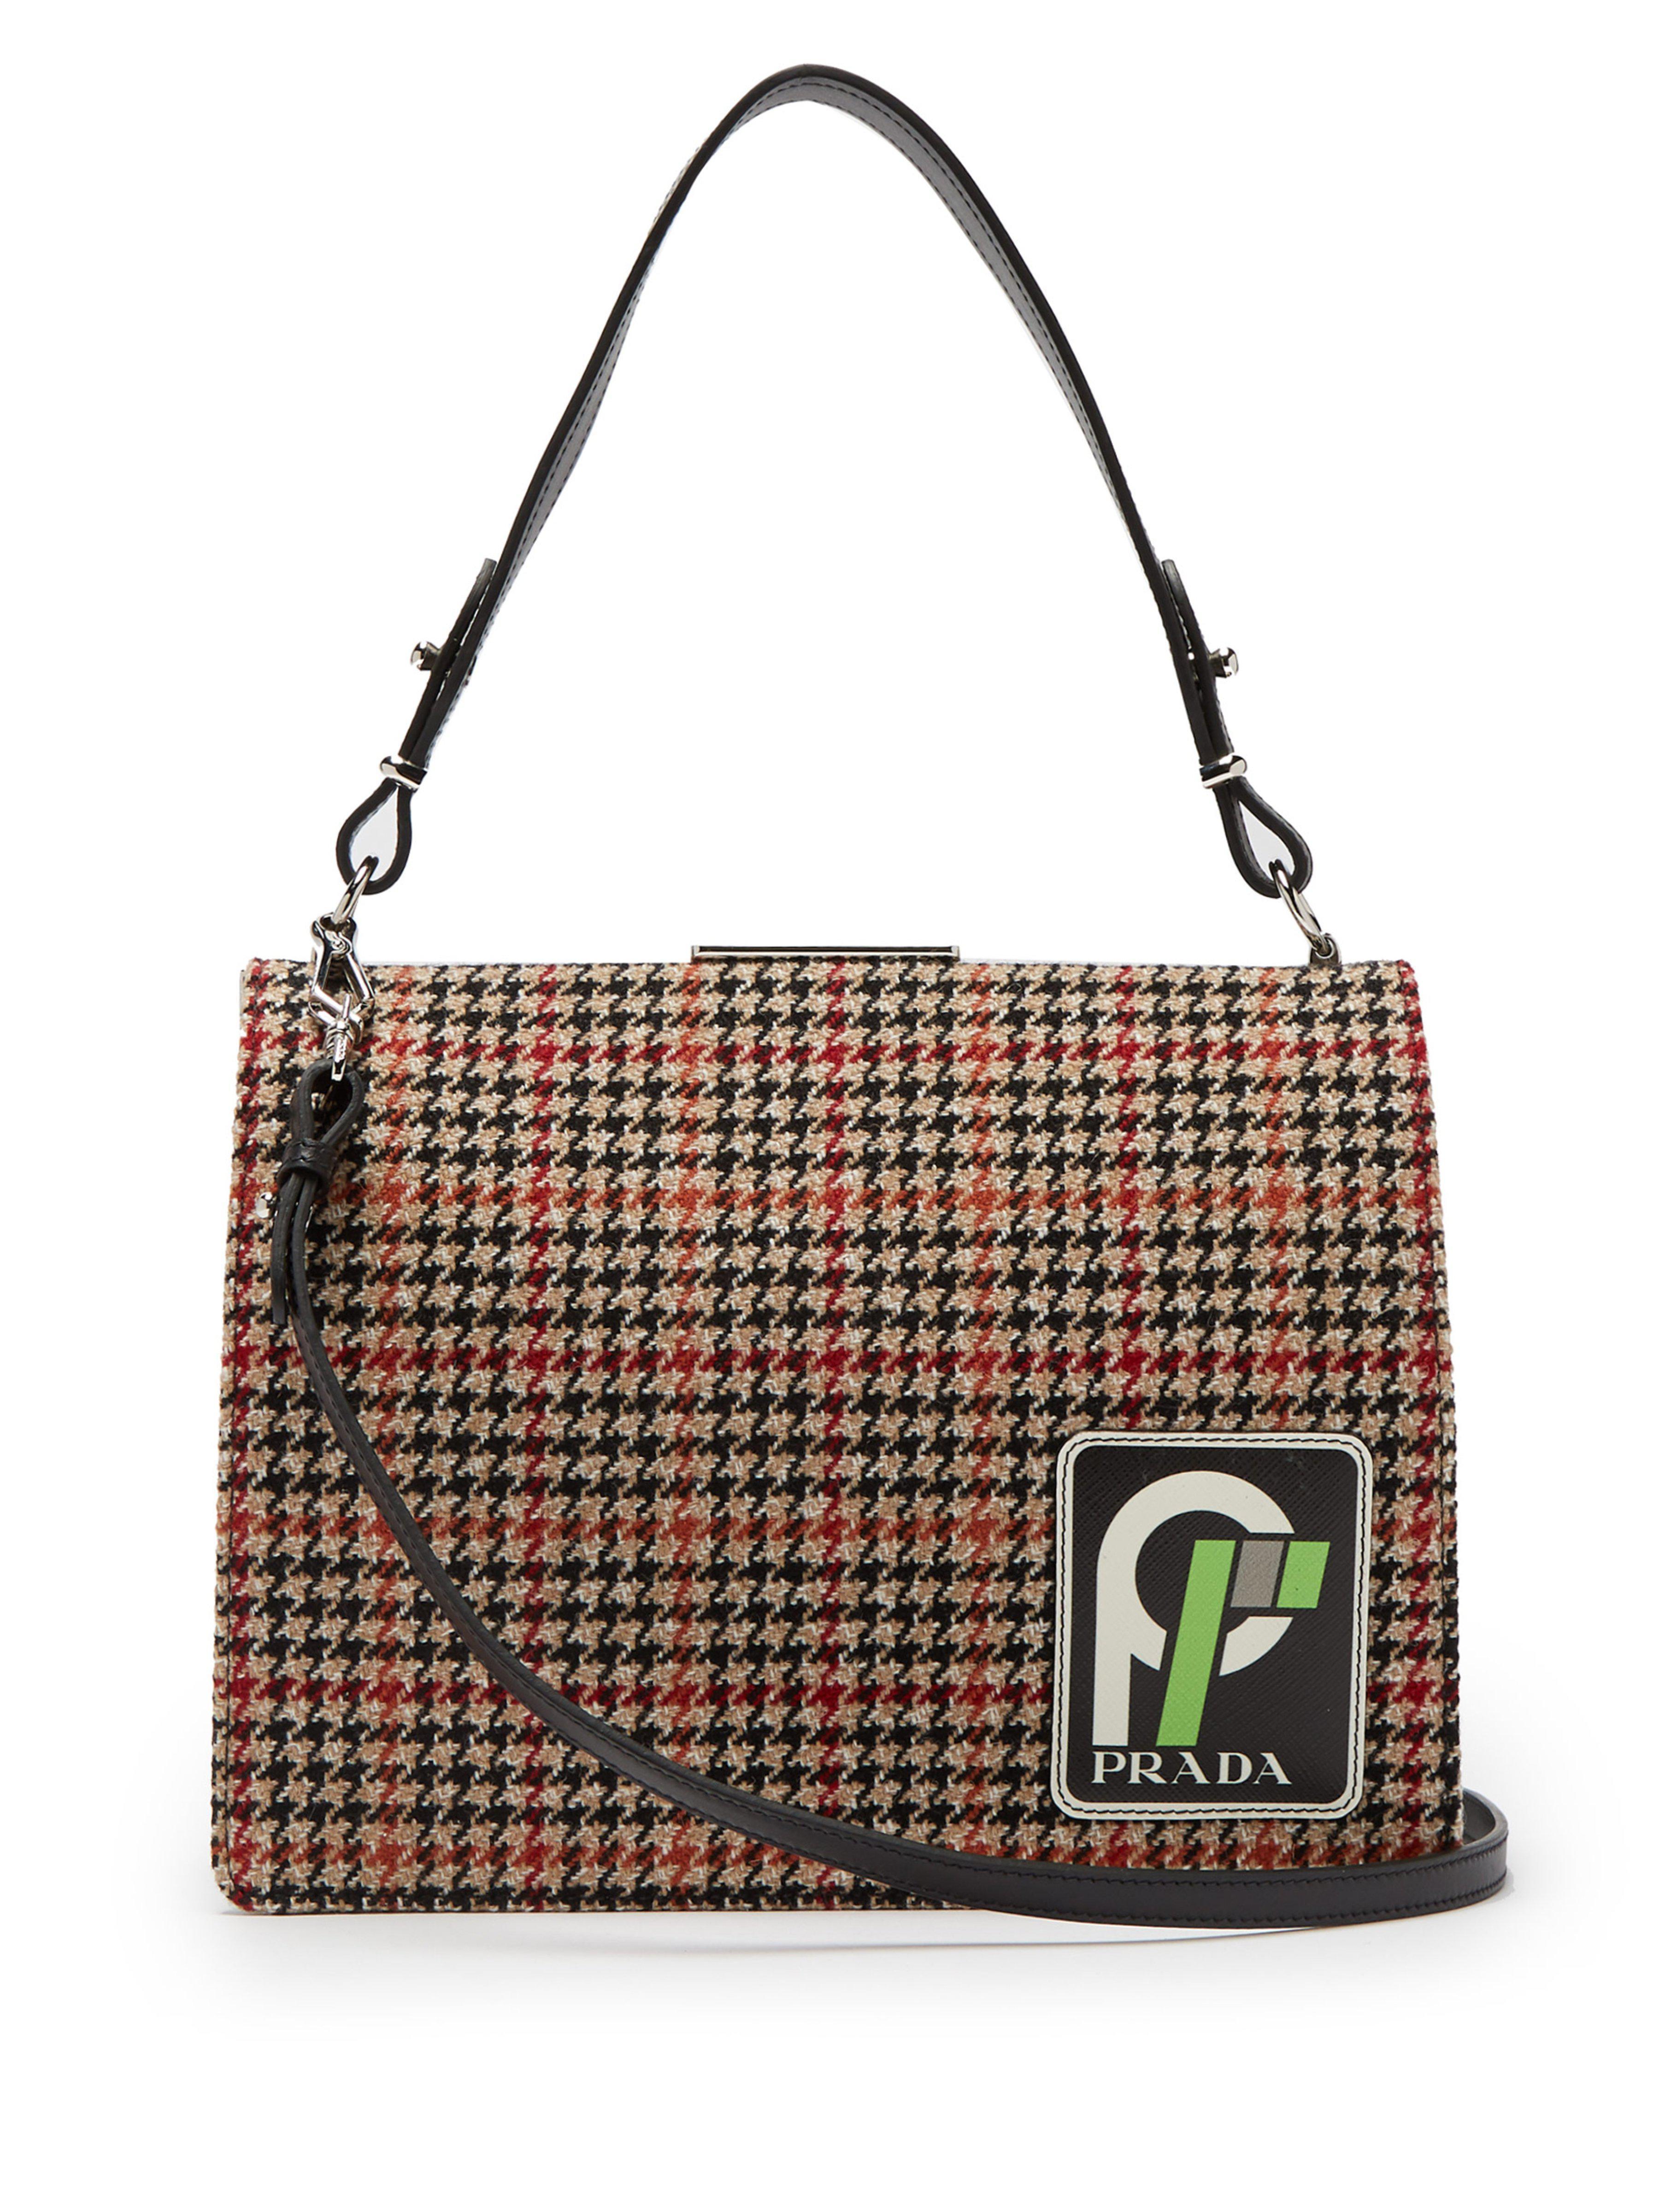 Prada - Black Frame Logo Patch Houndstooth Bag - Lyst. View fullscreen 8c950d401018d